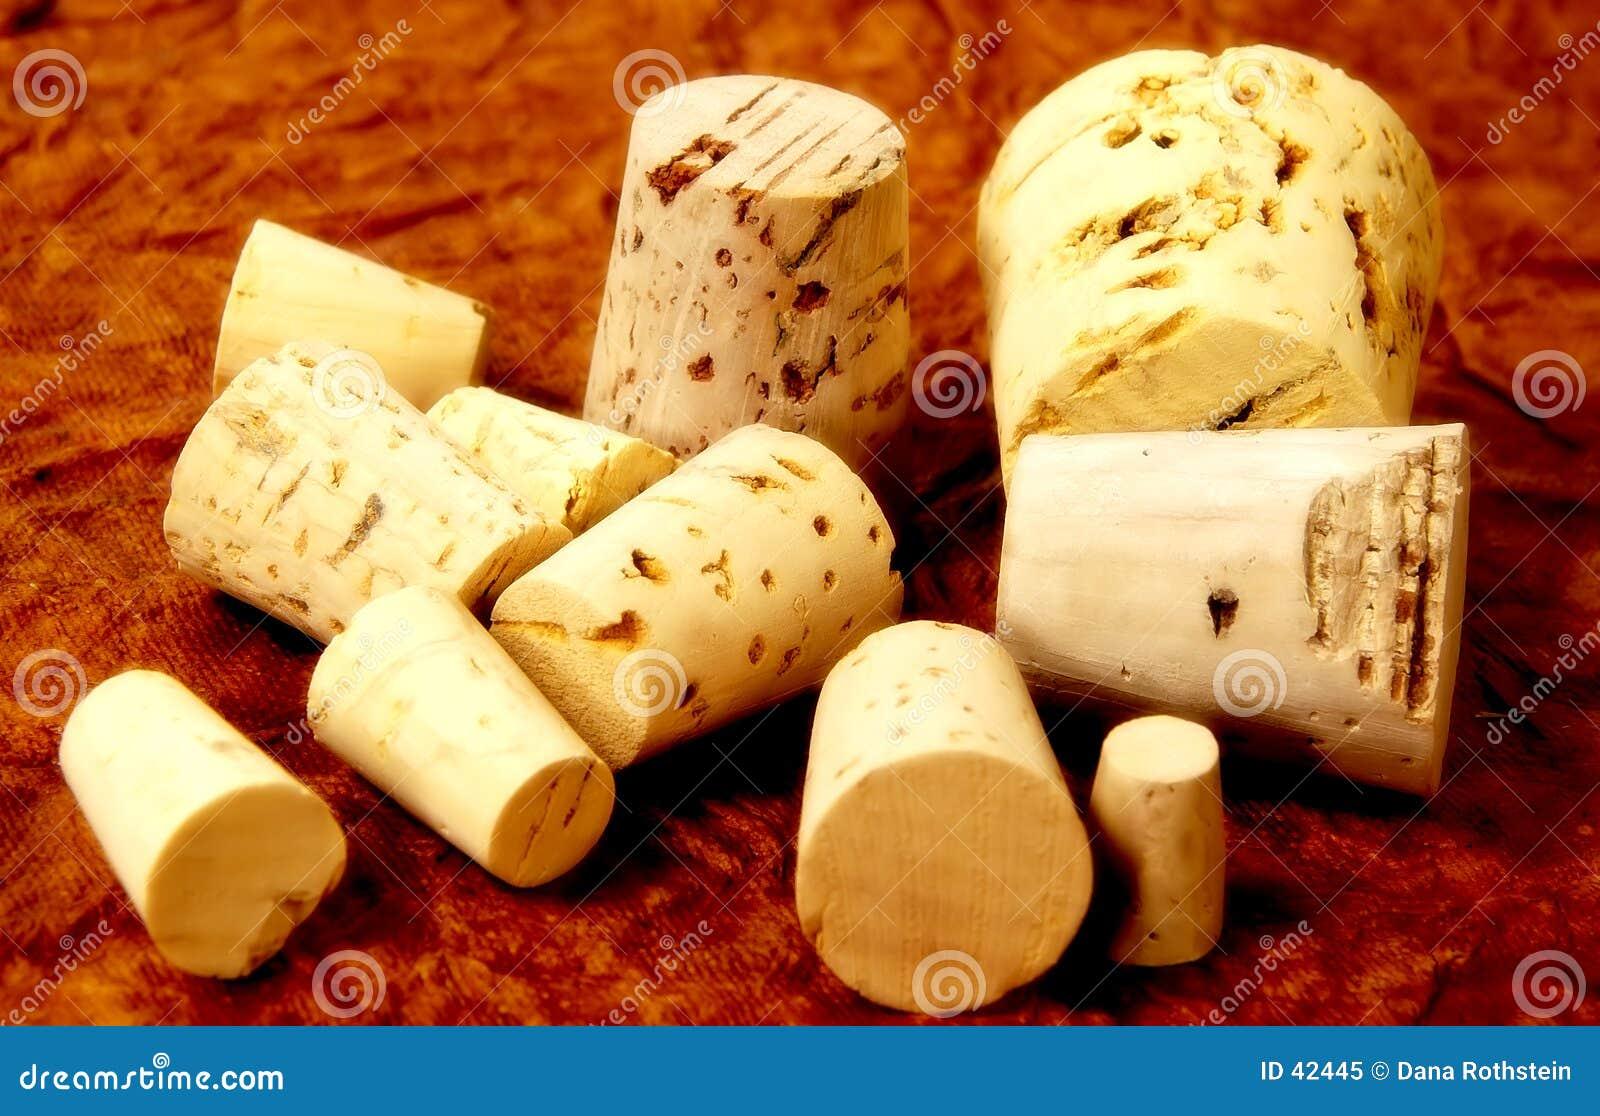 Various Corks